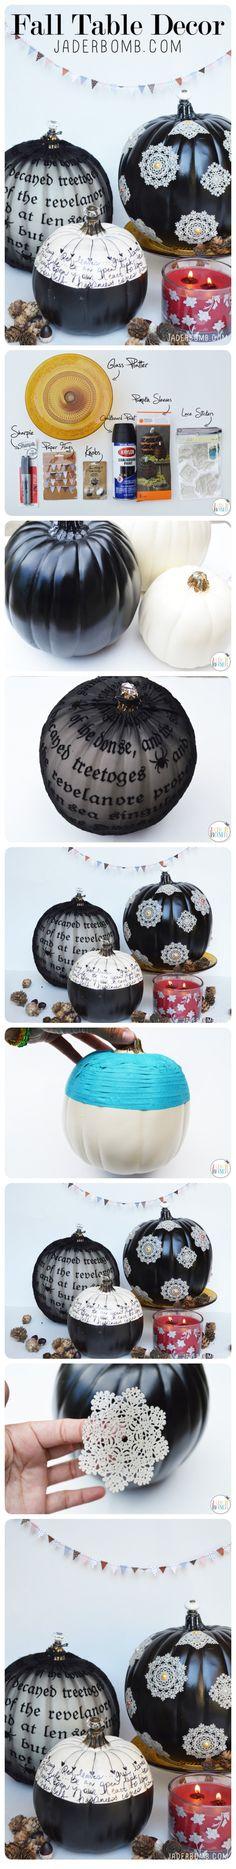 DIY Black Pumpkins halloween halloween party halloween decorations halloween crafts halloween ideas diy halloween halloween pumpkins halloween jack o lanterns halloween party decor jack o lantern ideas